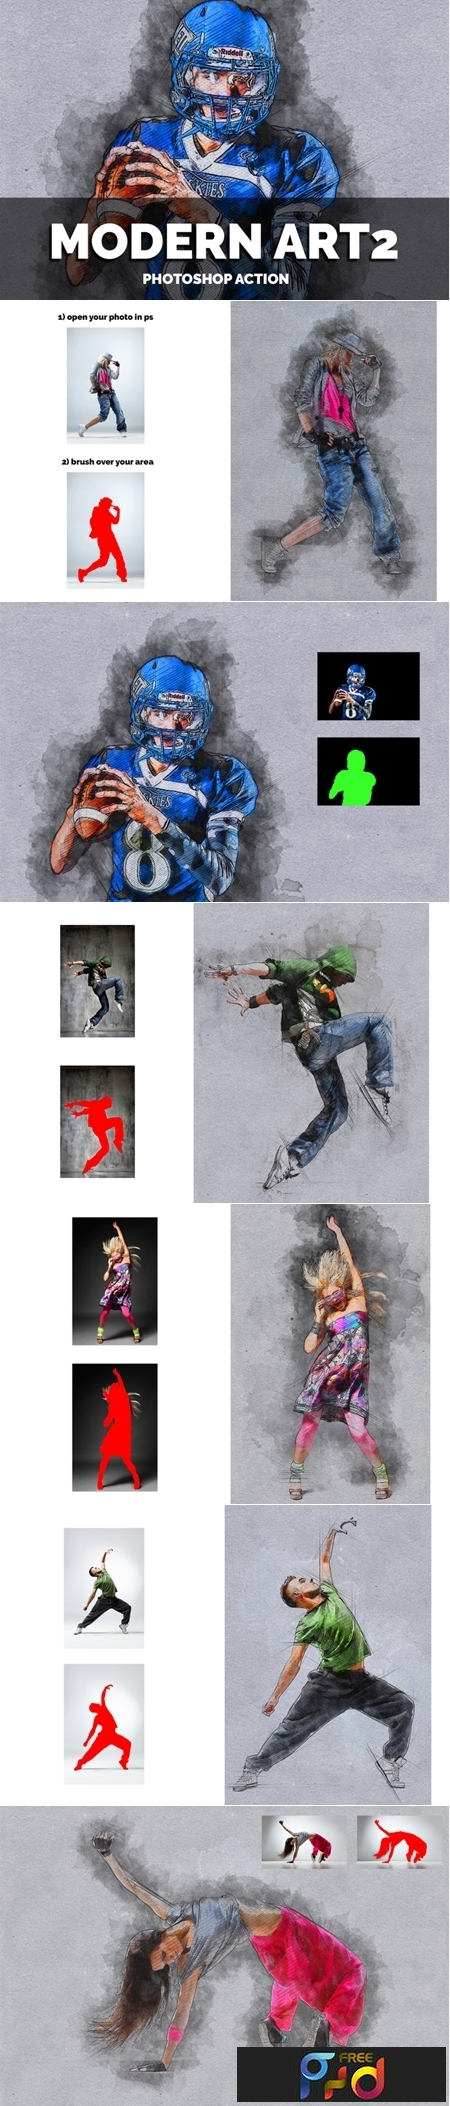 Modern Art2 Photoshop Action 1